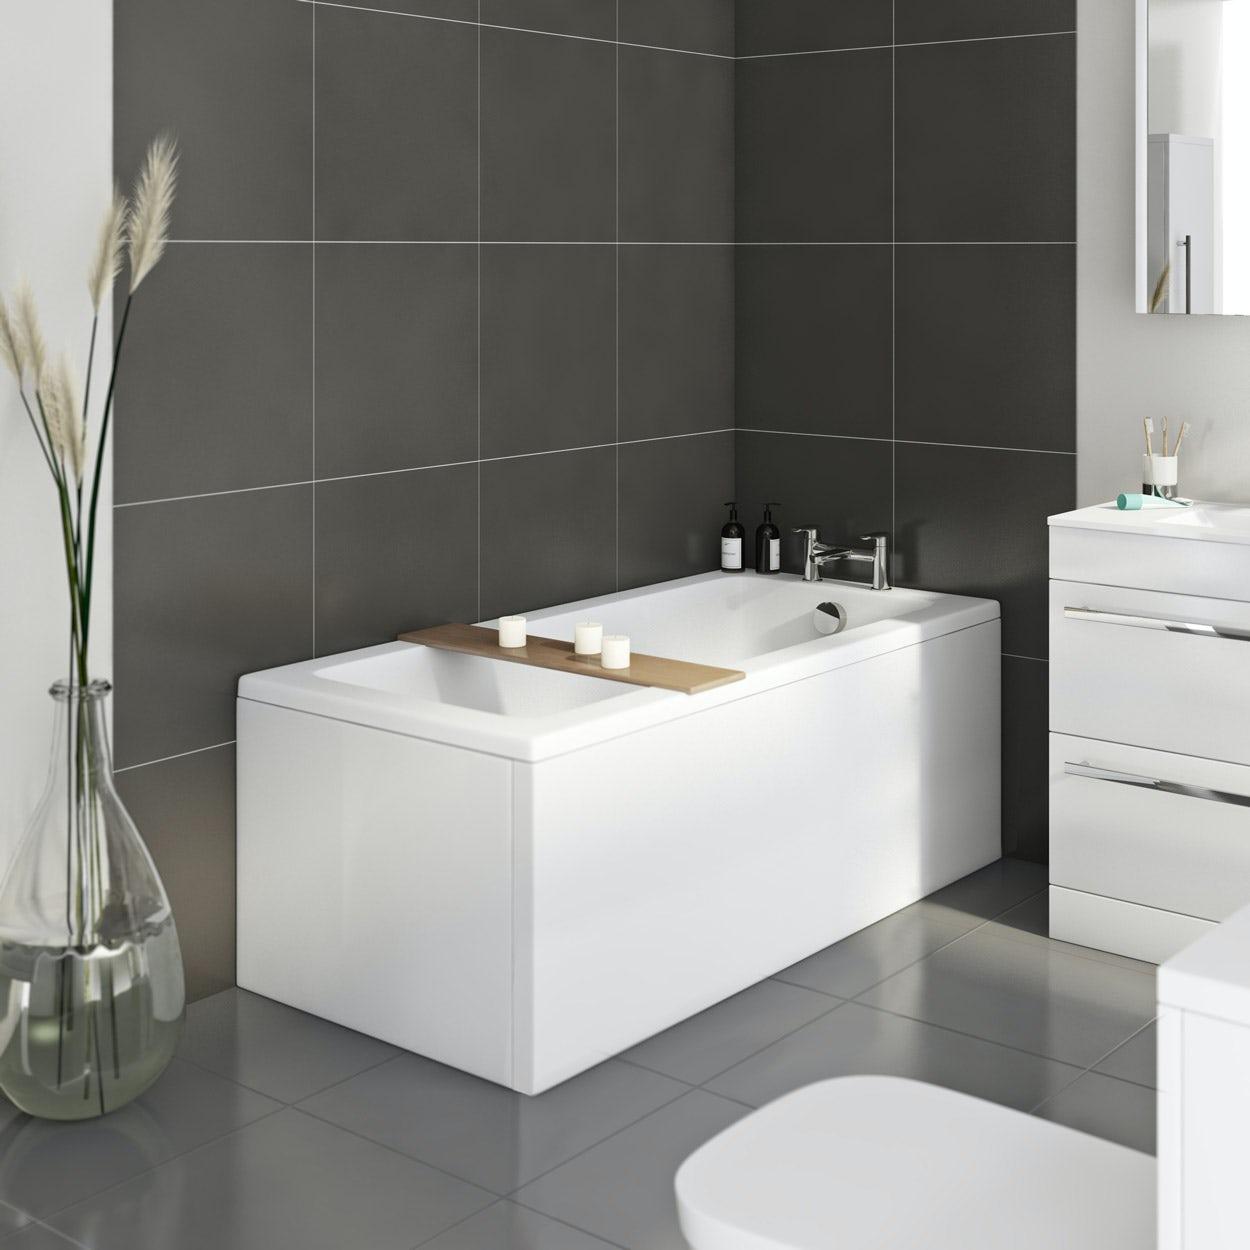 1700 x 750 Designer Square Single Ended Bath Straight Bathroom Bathtub